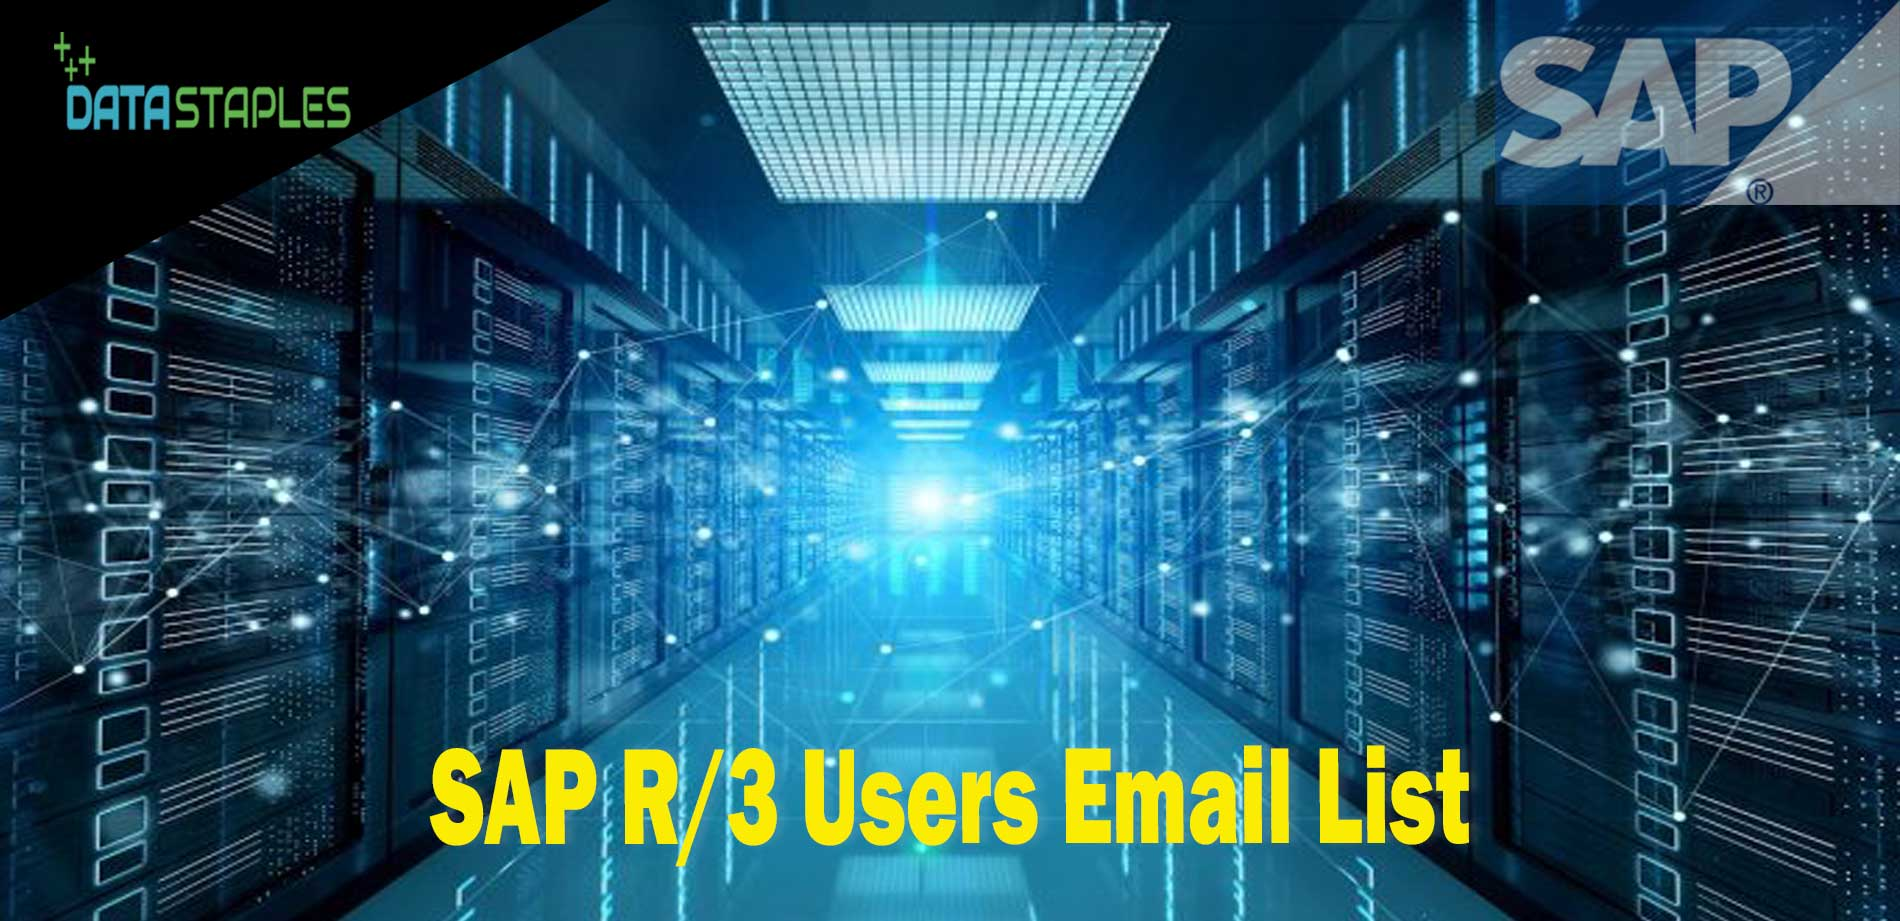 SAP R/3 Users Email List   DataStaples